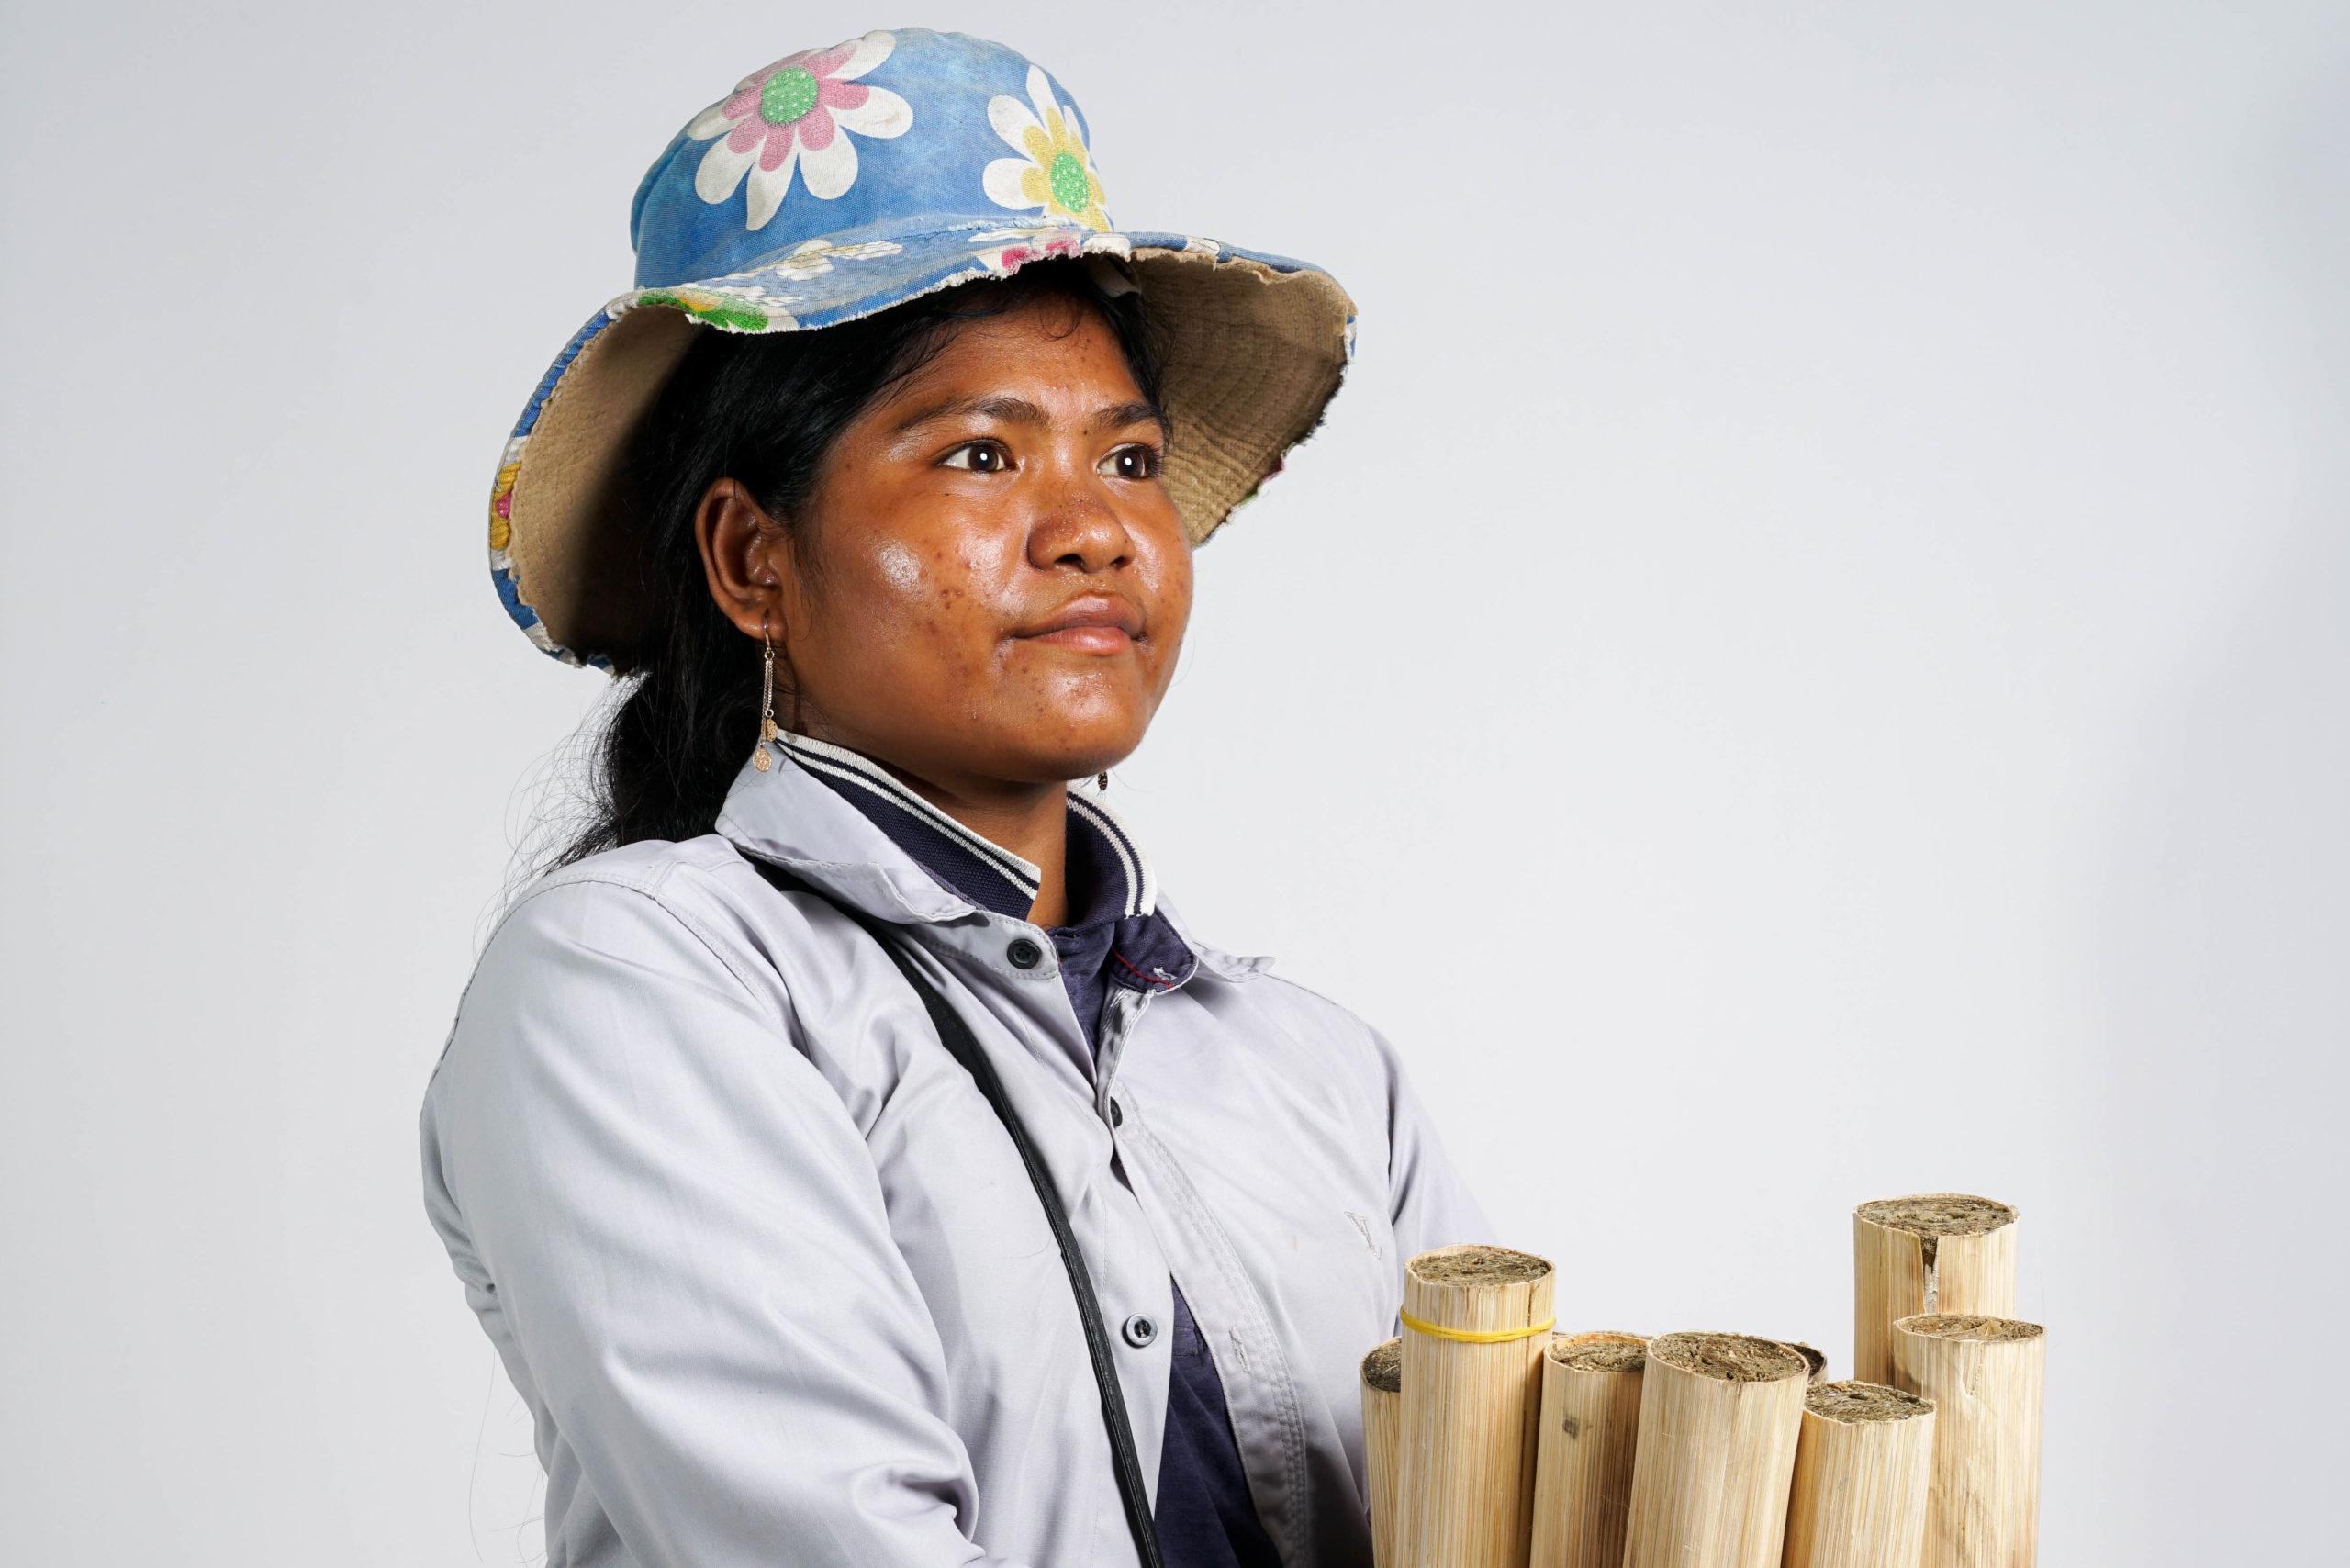 Irving Penh: Portraits of Phnom Penh's riverside sellers